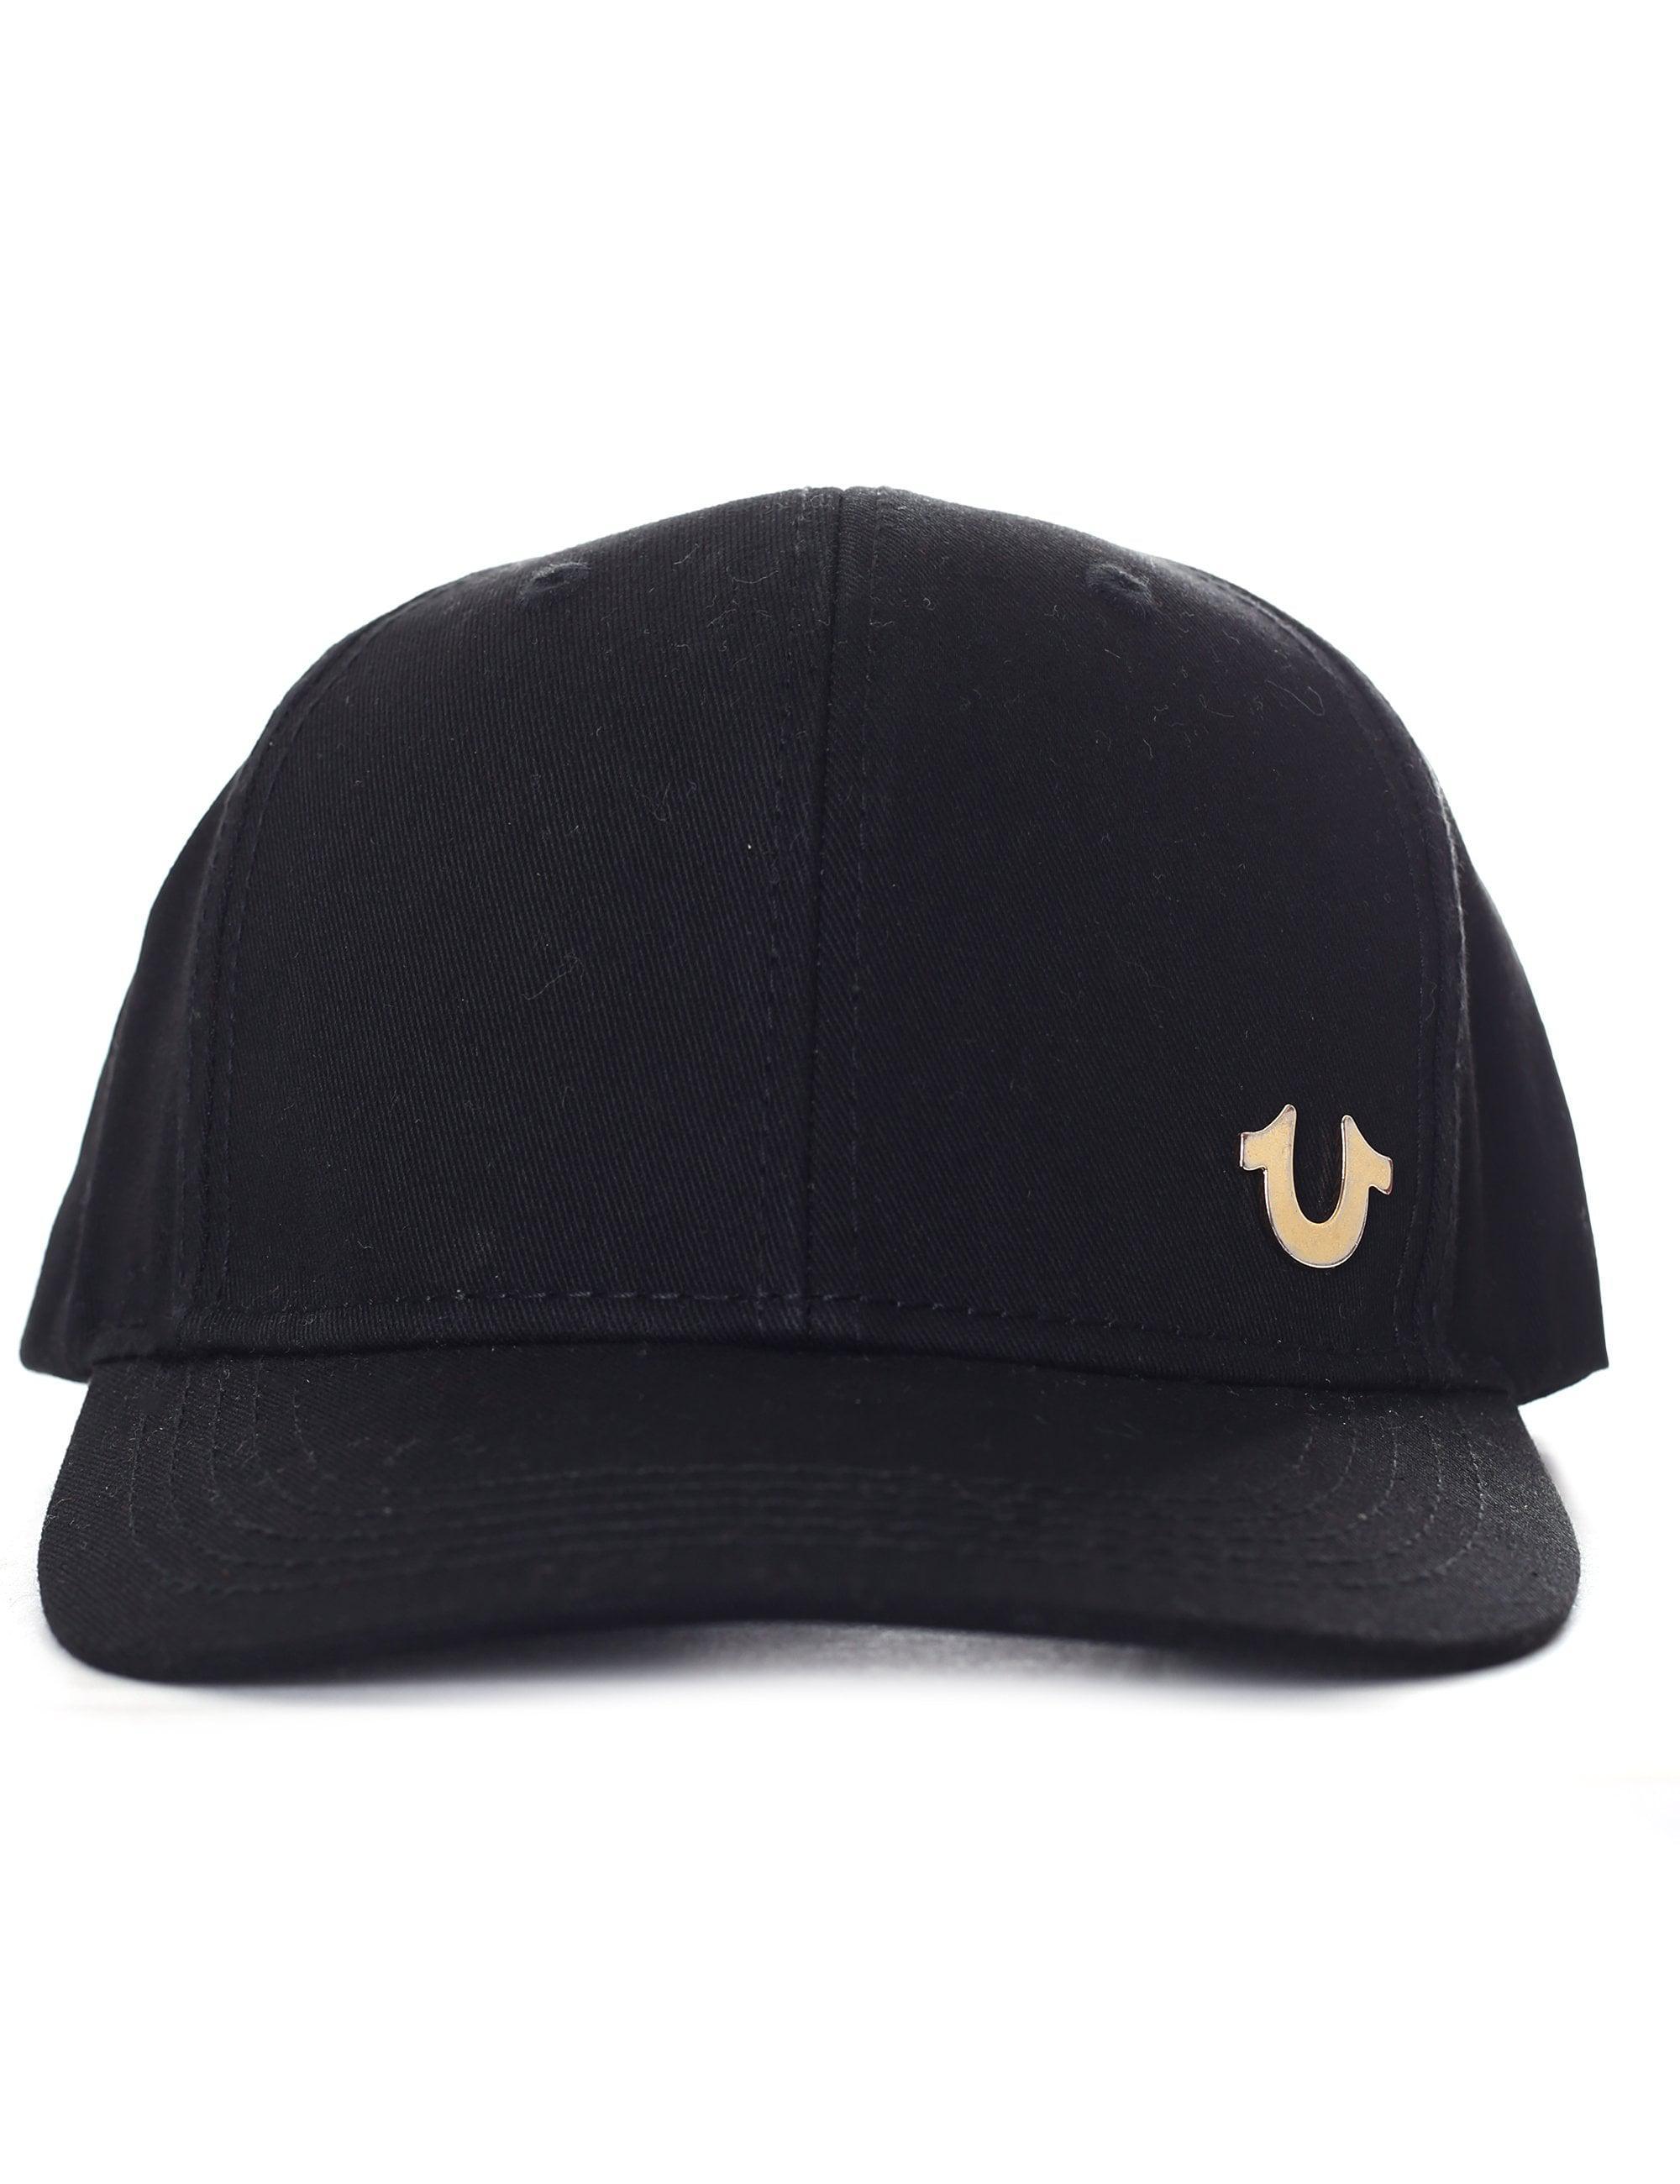 7c75a25d7f7 True Religion Metal Logo Black Baseball Cap in Black for Men - Lyst